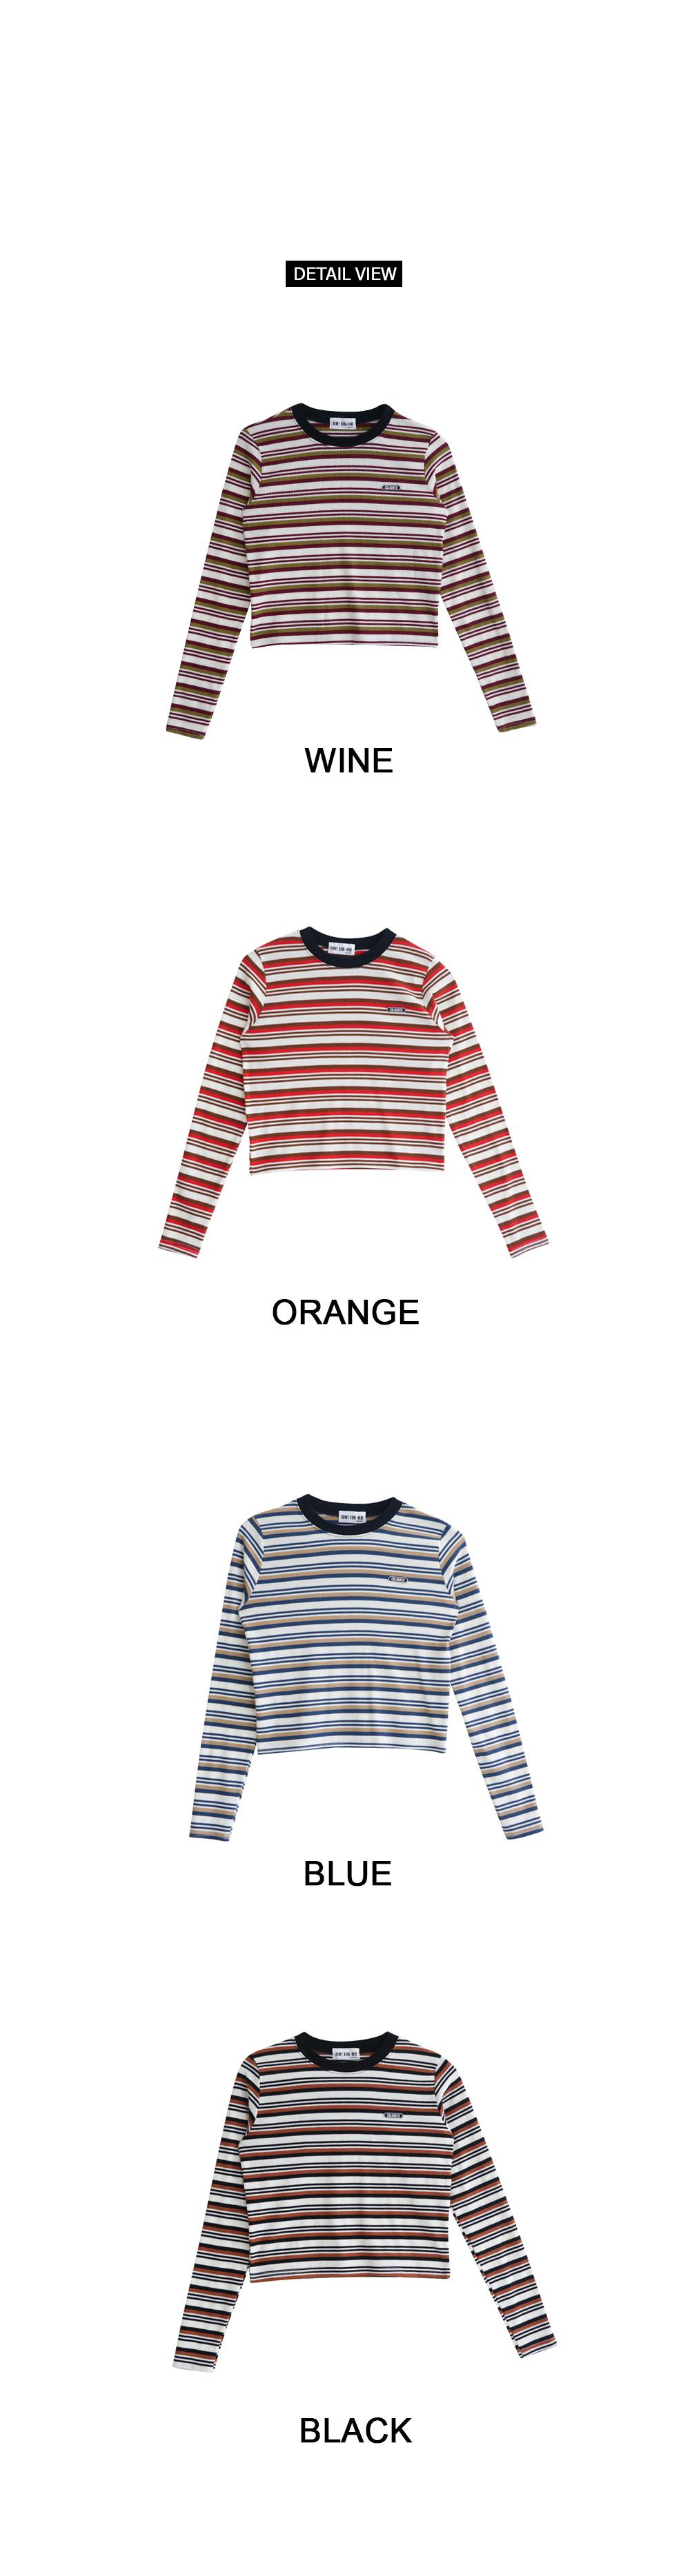 Maple Dangara long-sleeved T-shirt